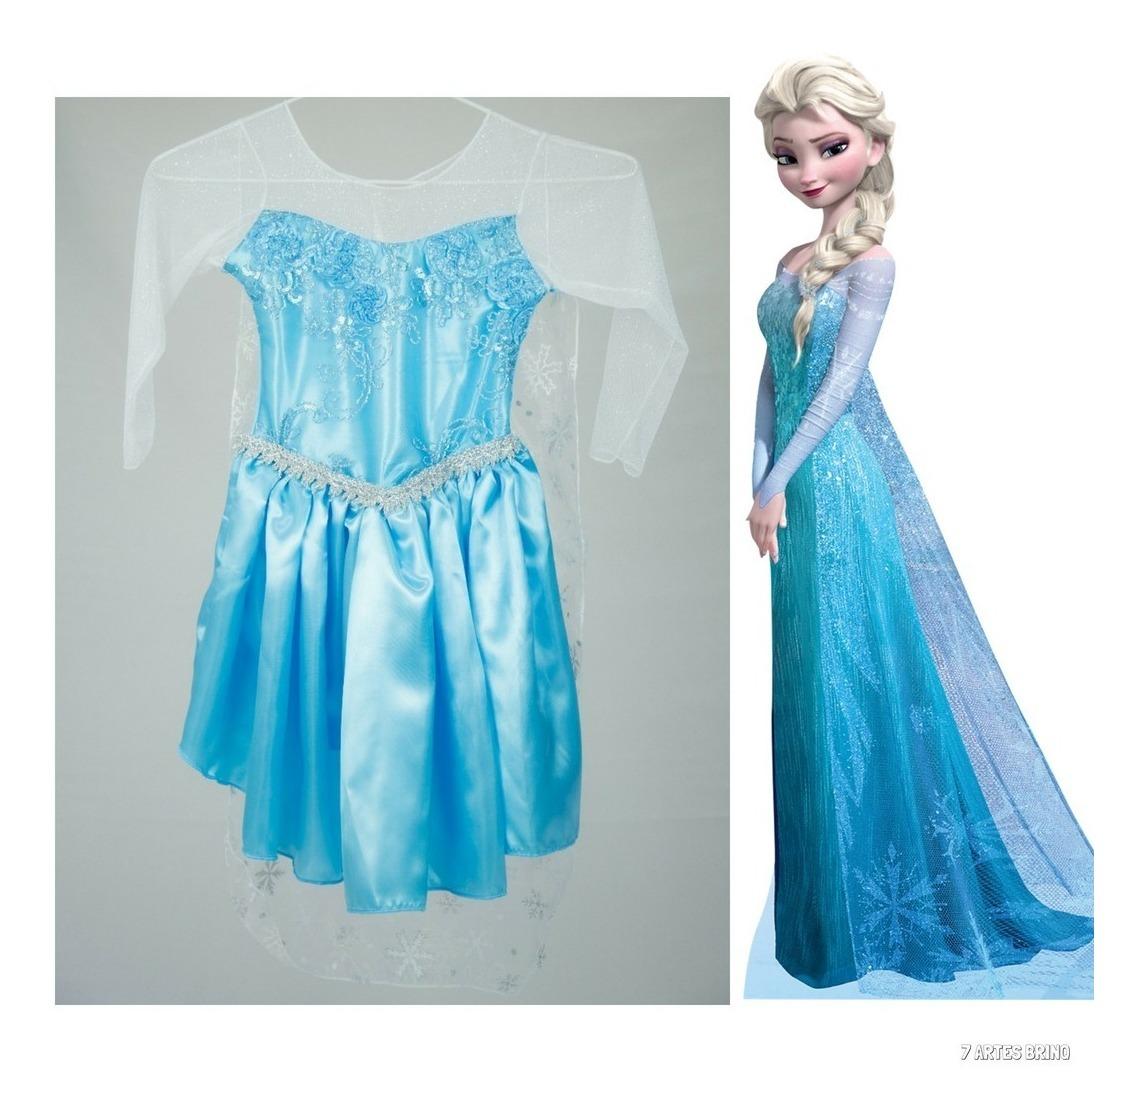 Vestido Fantasia Frozen Festa Infantil Princesa Elsa Anna